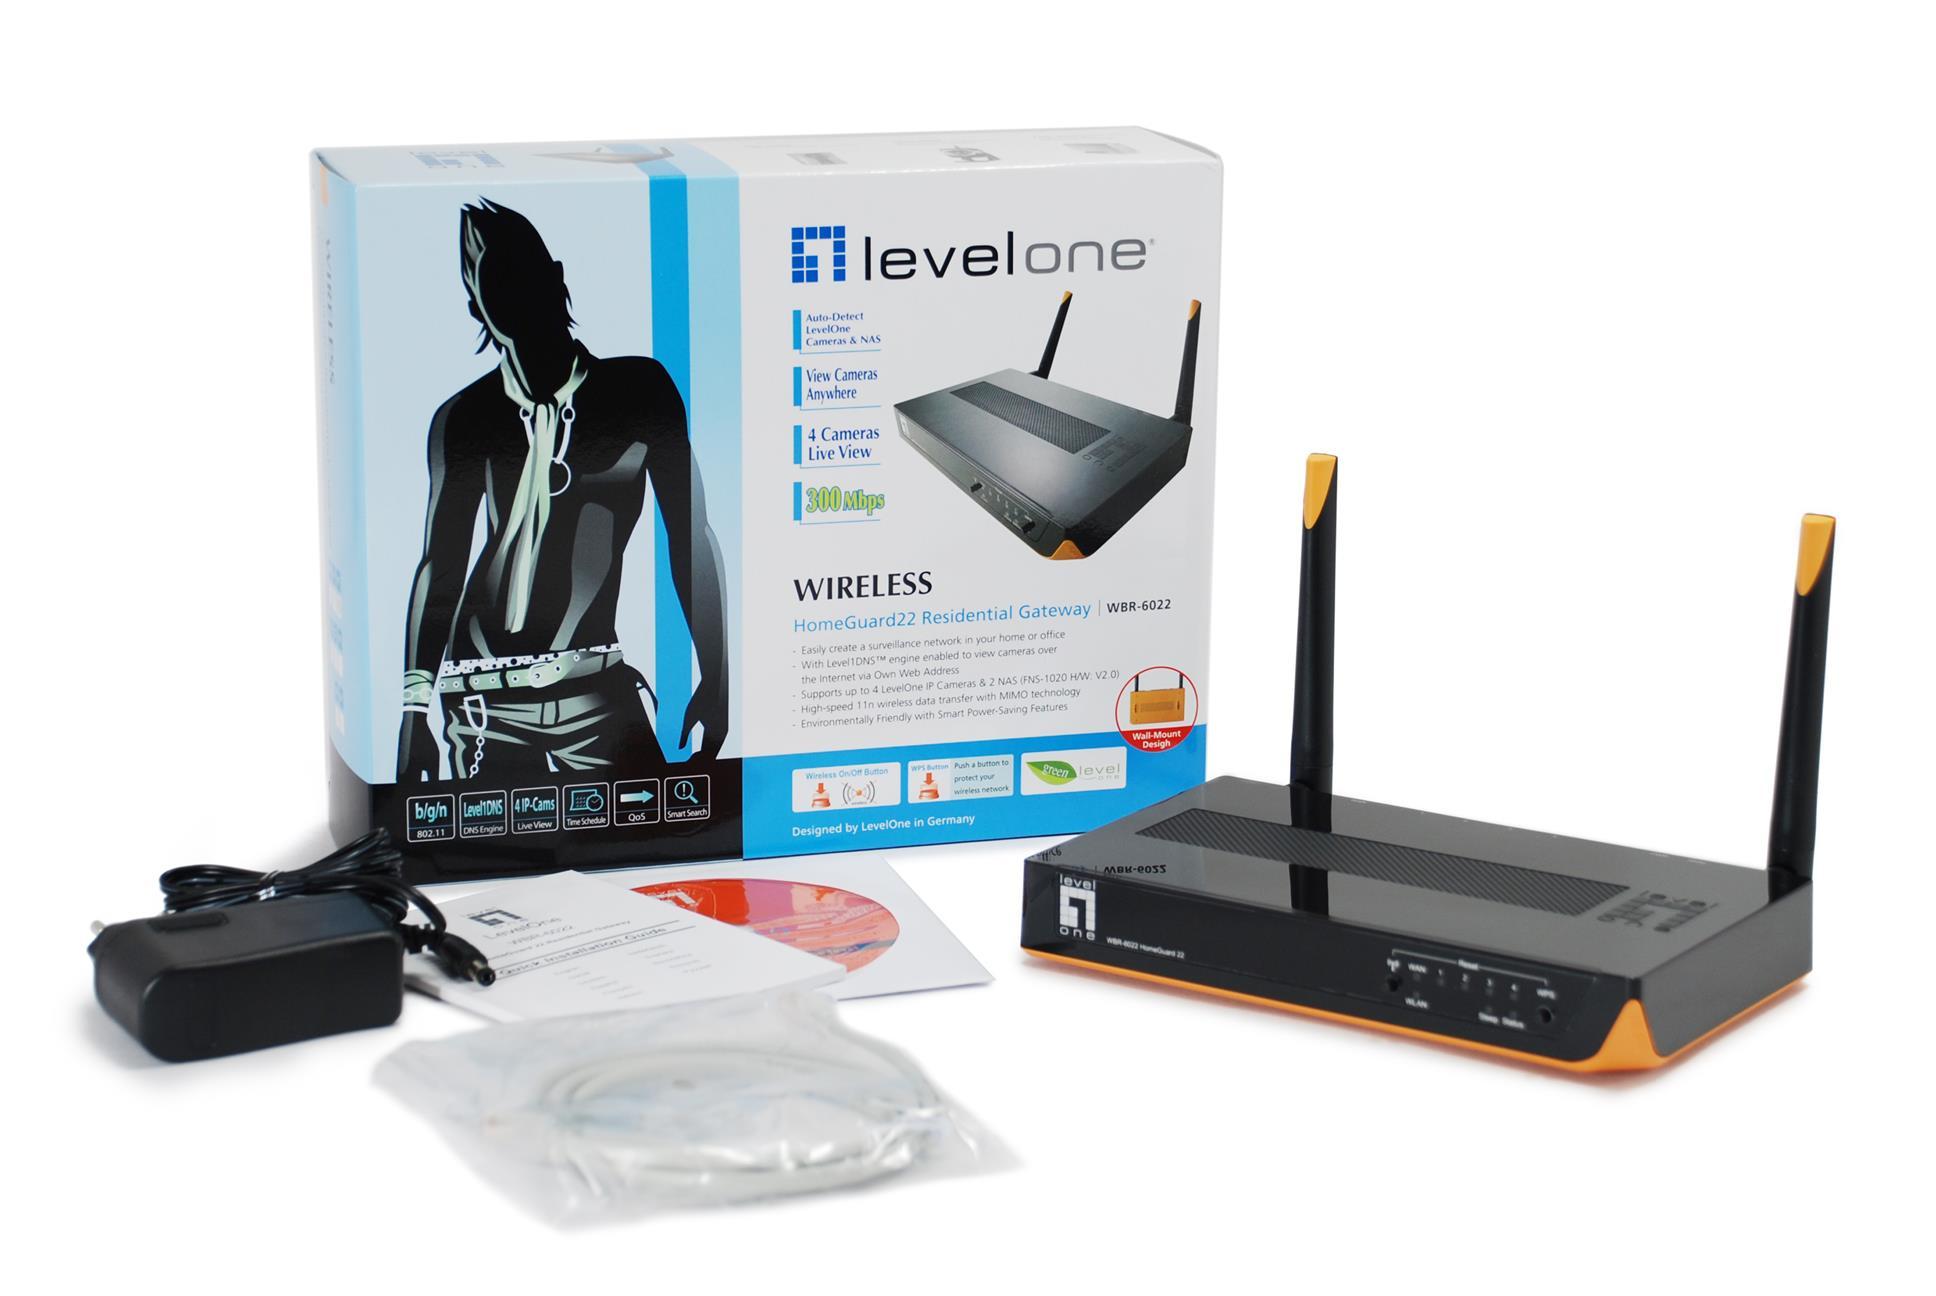 Купить Wi-Fi-роутер 3Q Wireless 80211n broadband router